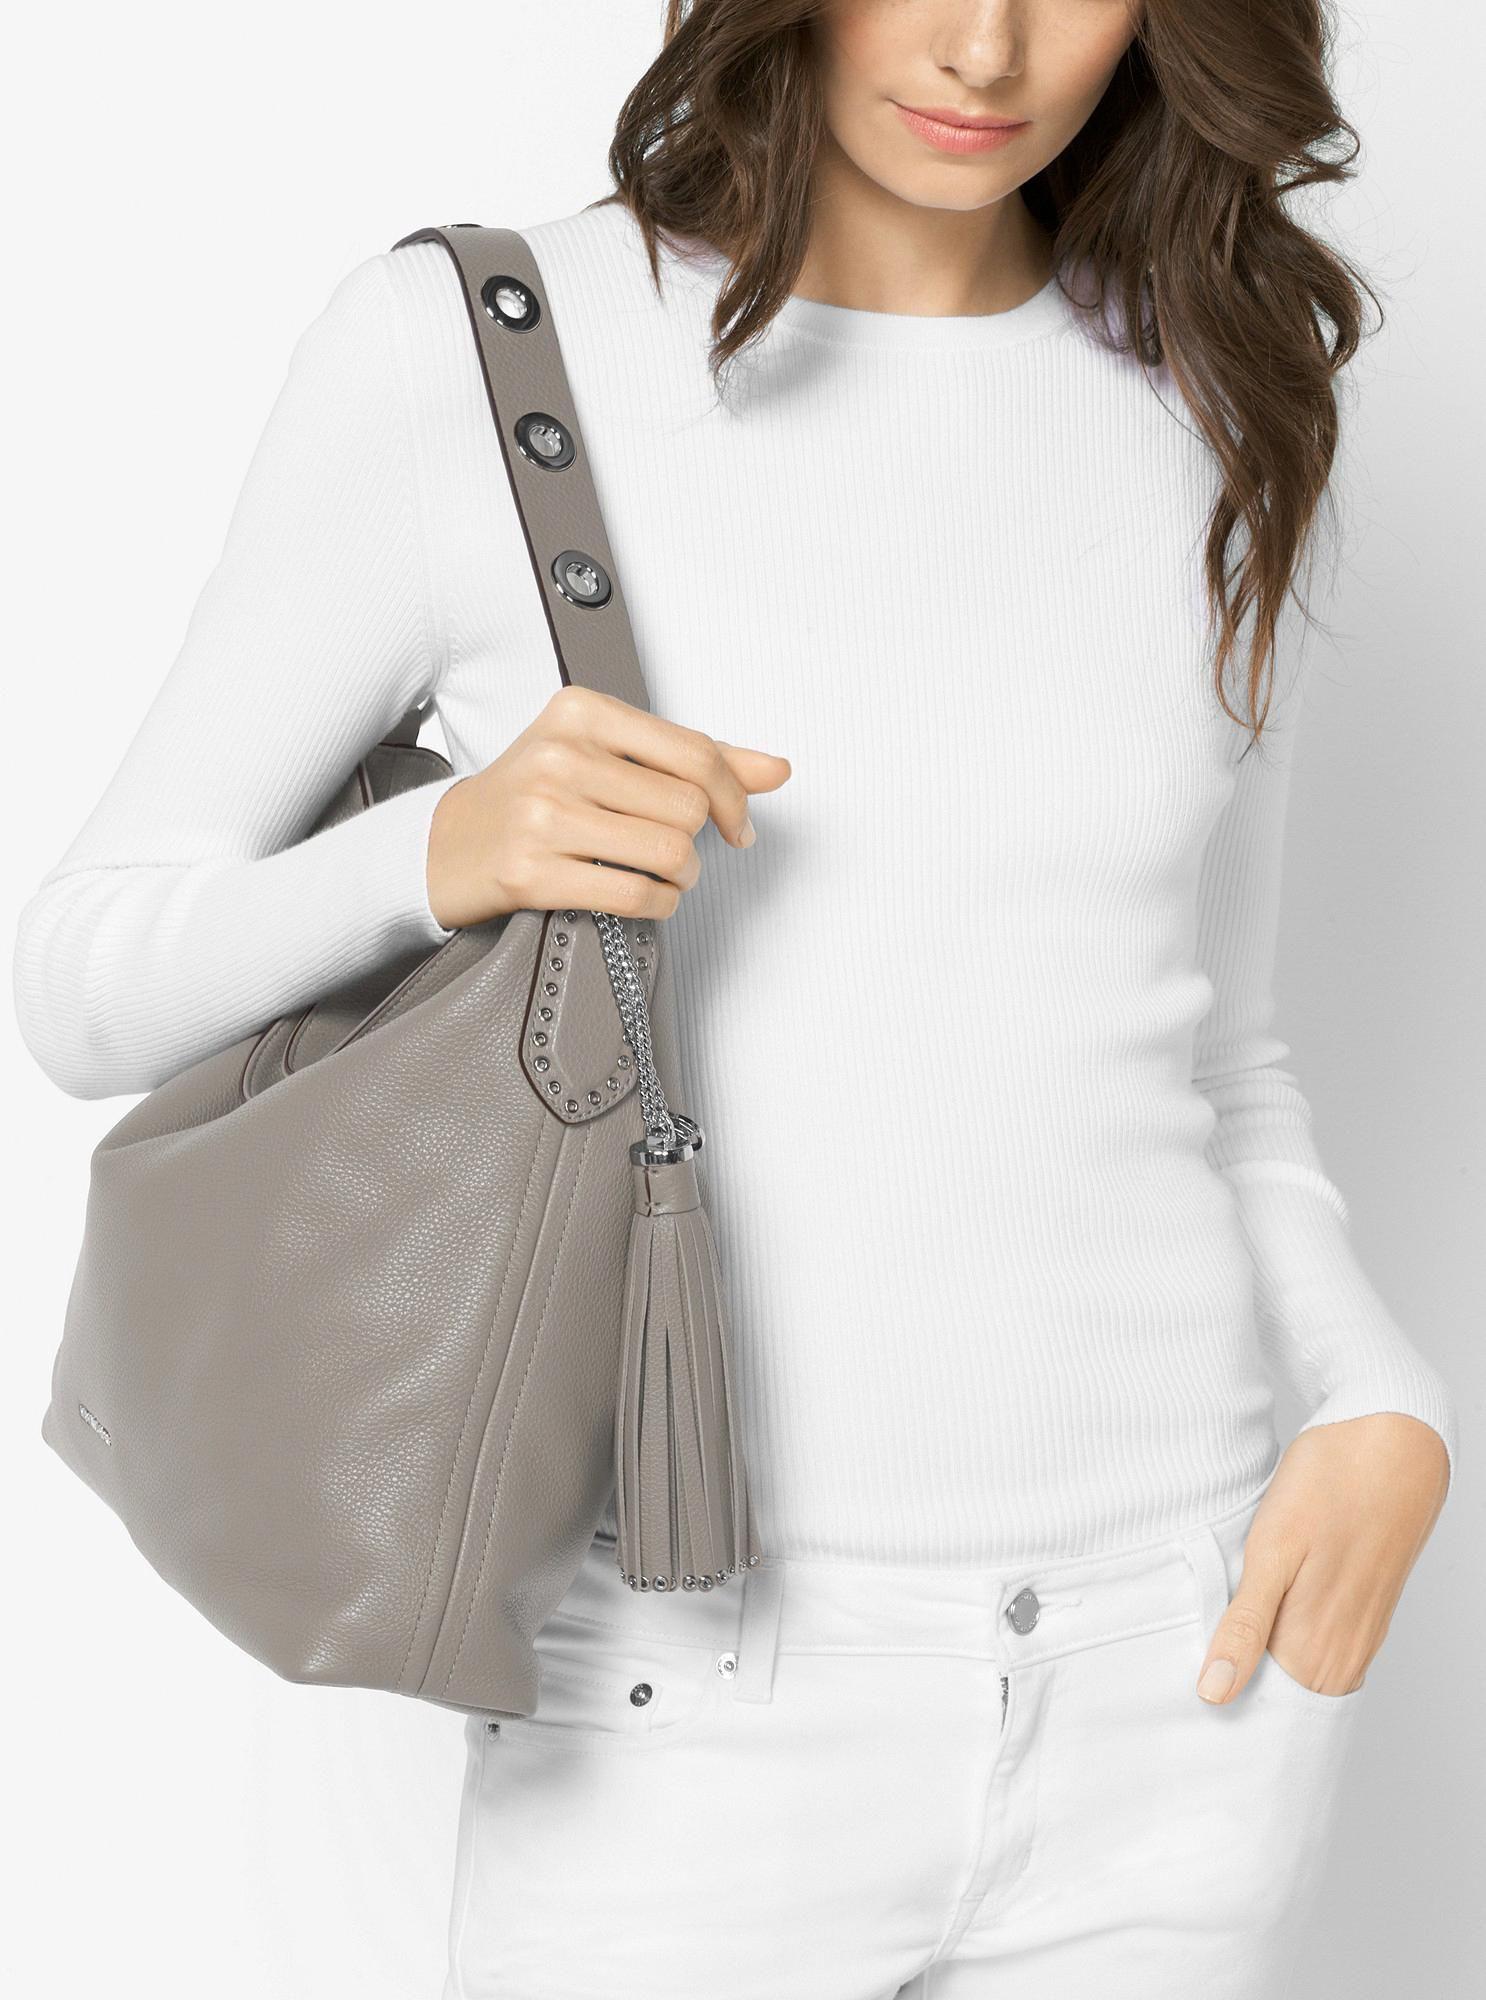 4778734252b2 Michael Kors Brooklyn Large Leather Shoulder Bag - Optic White   Handbagsmichaelkors